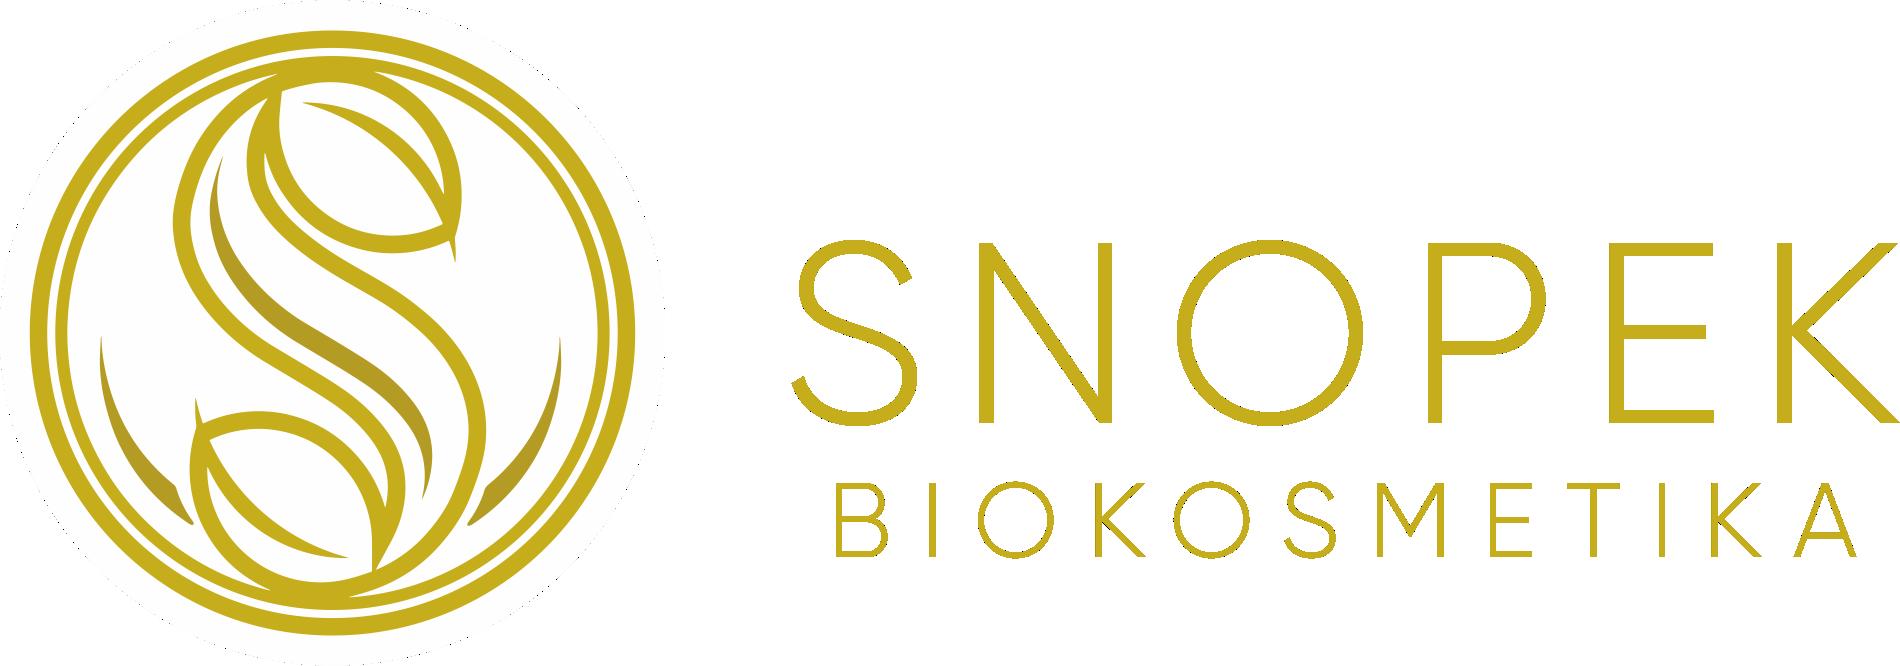 SNOPEK Biokosmetika